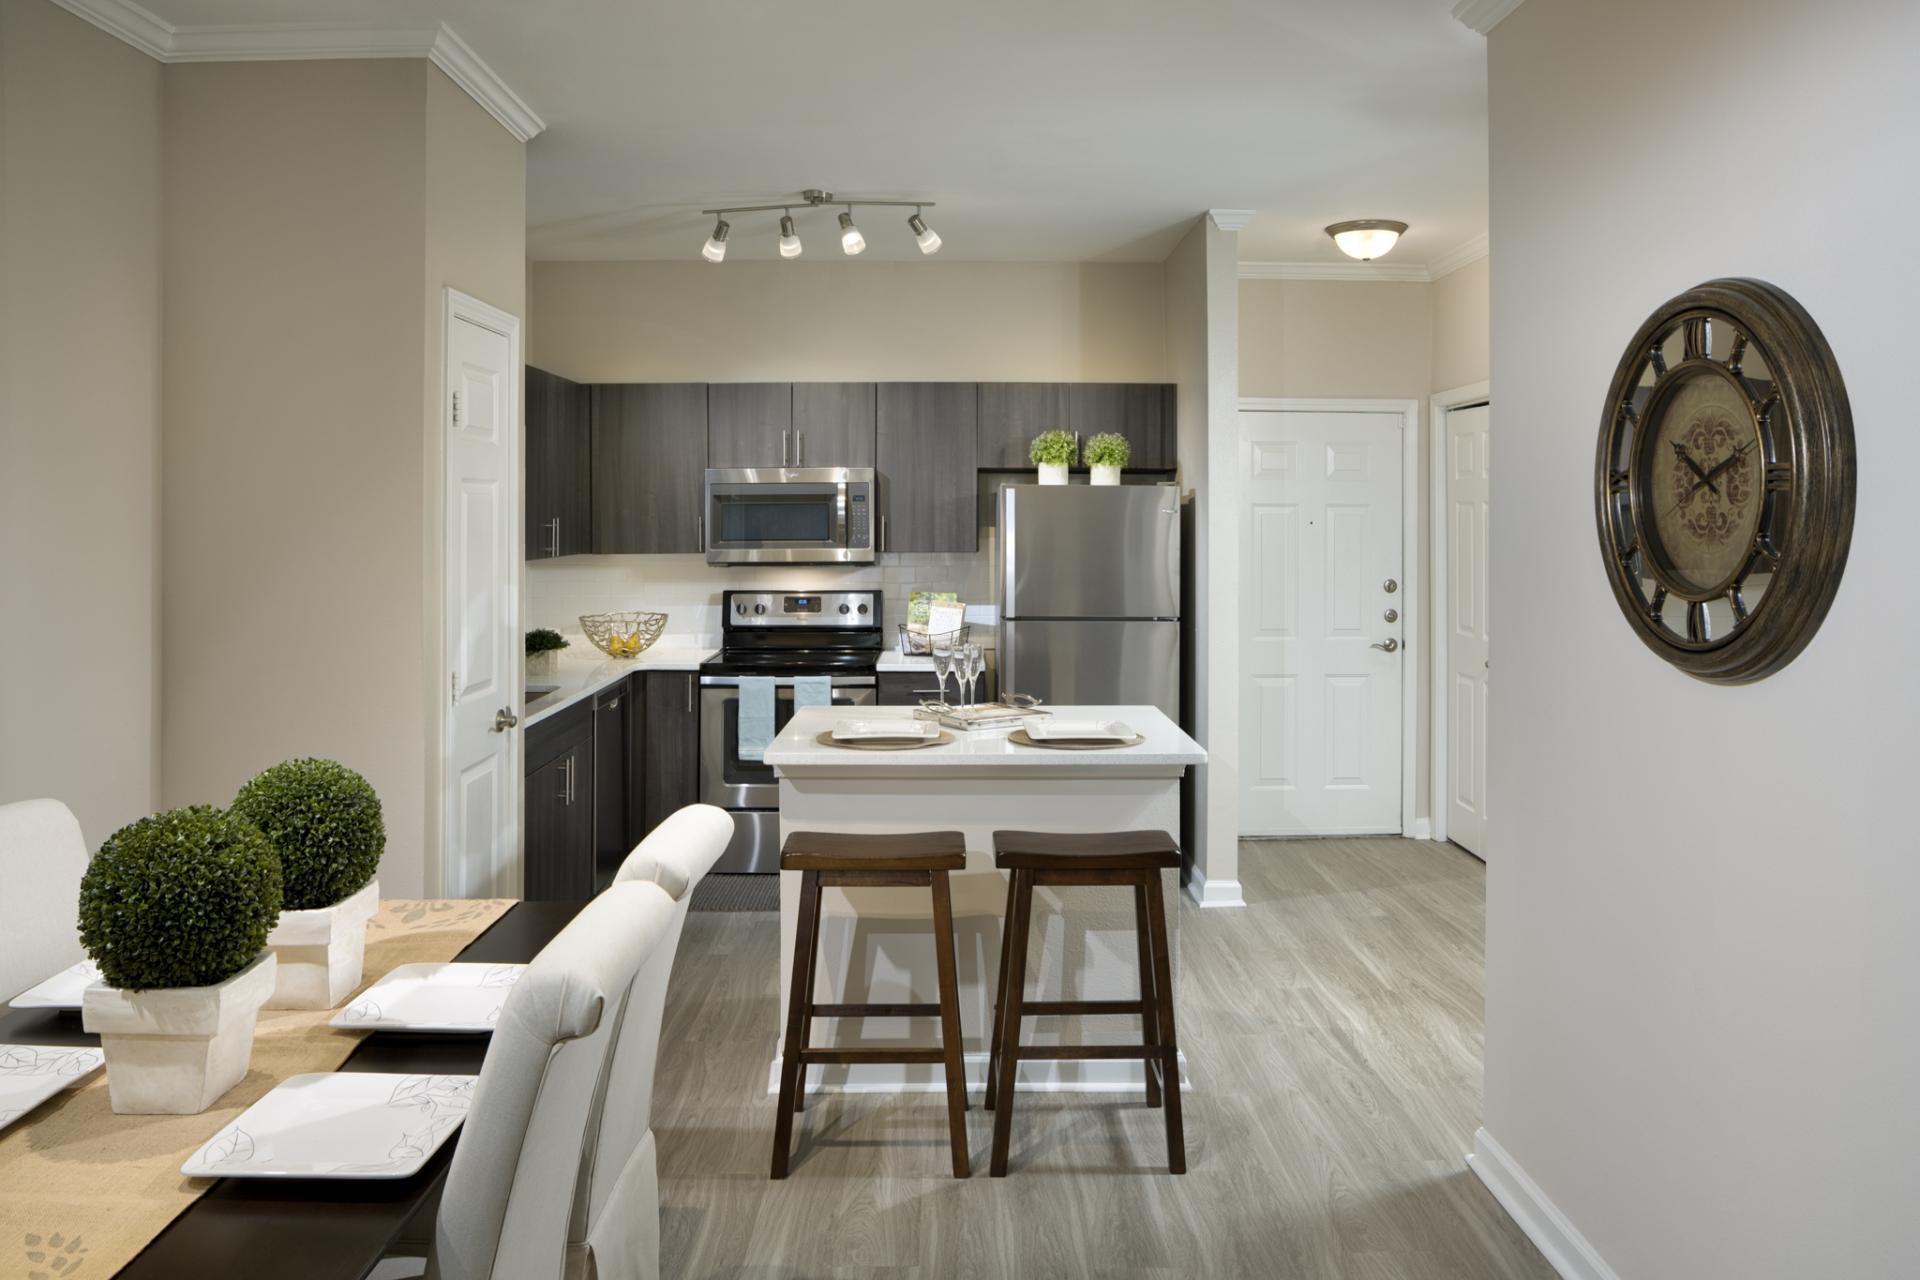 Camden Creekstone Apartments image 0